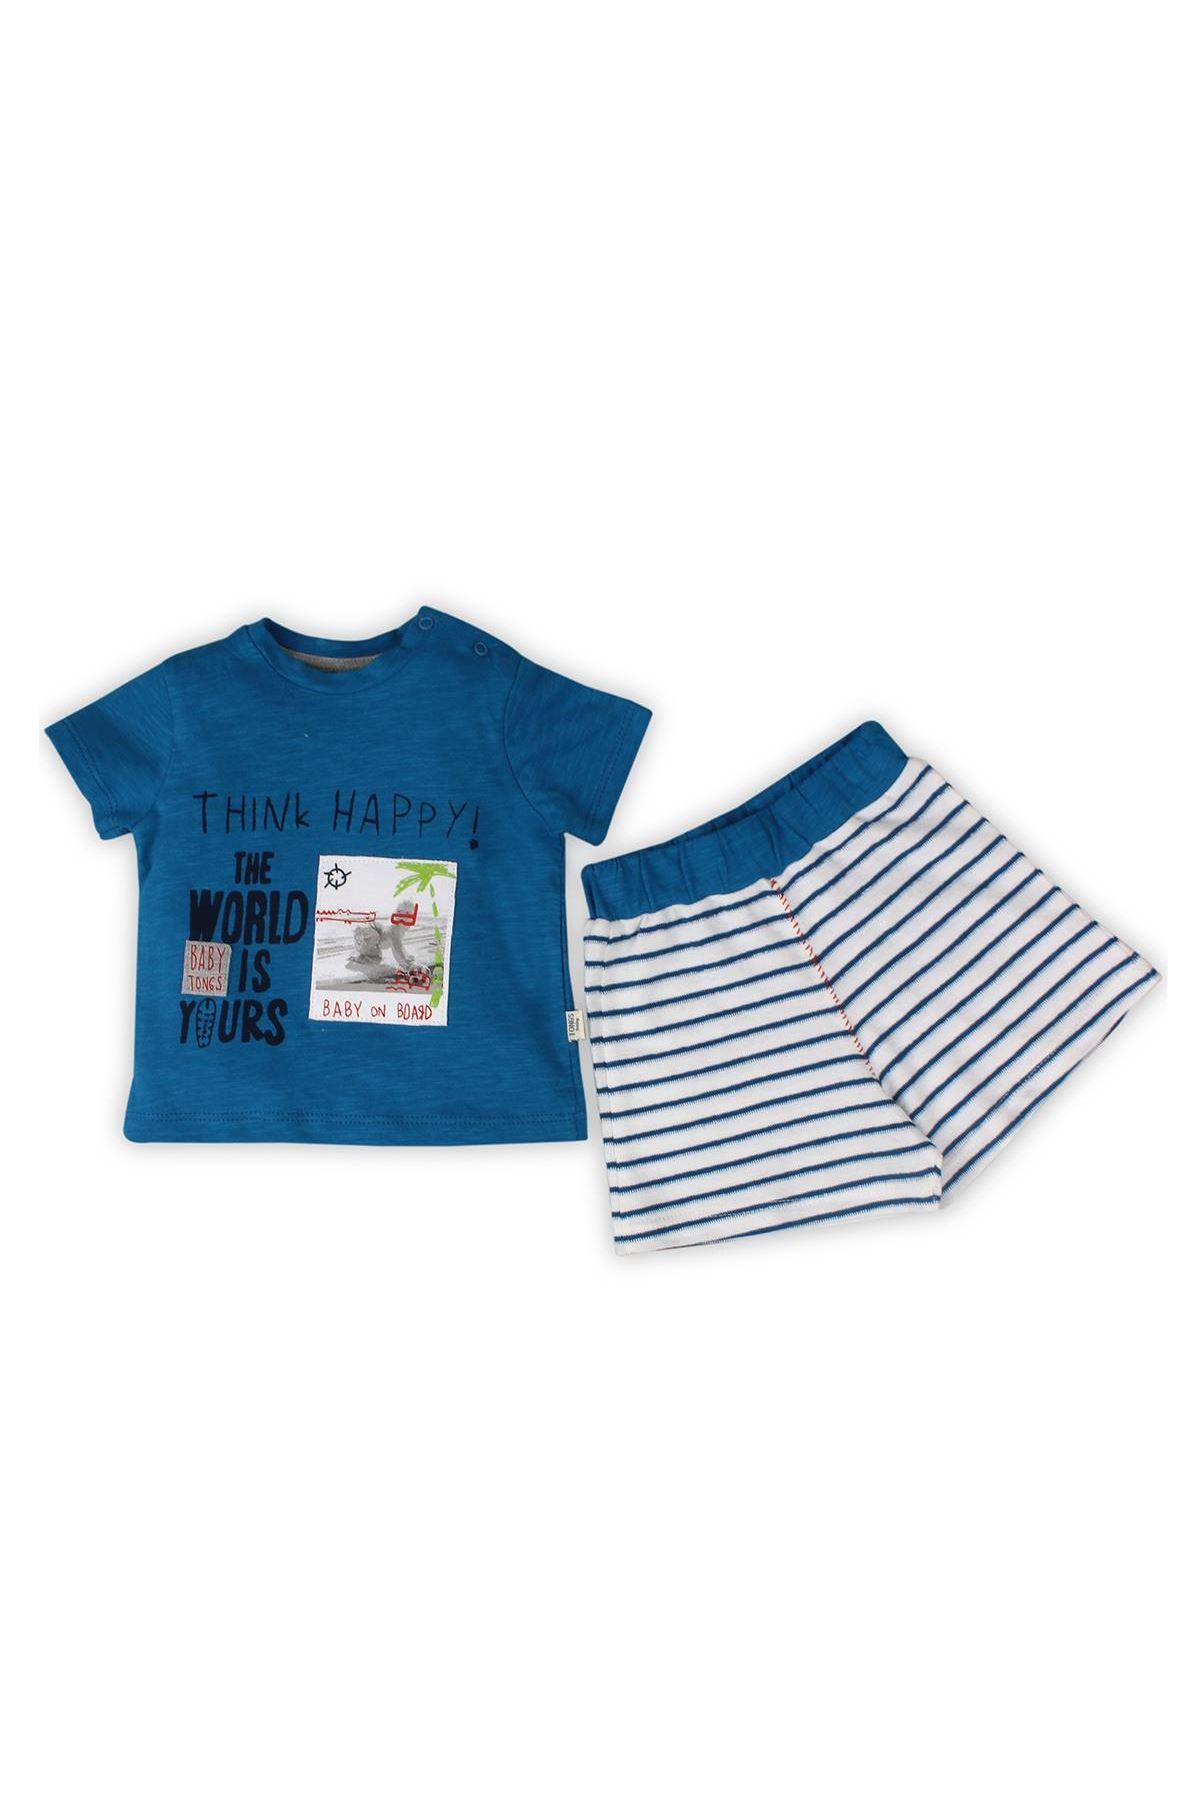 Tongs Baby On Board Şortlu 2li Takım 2583 Mavi